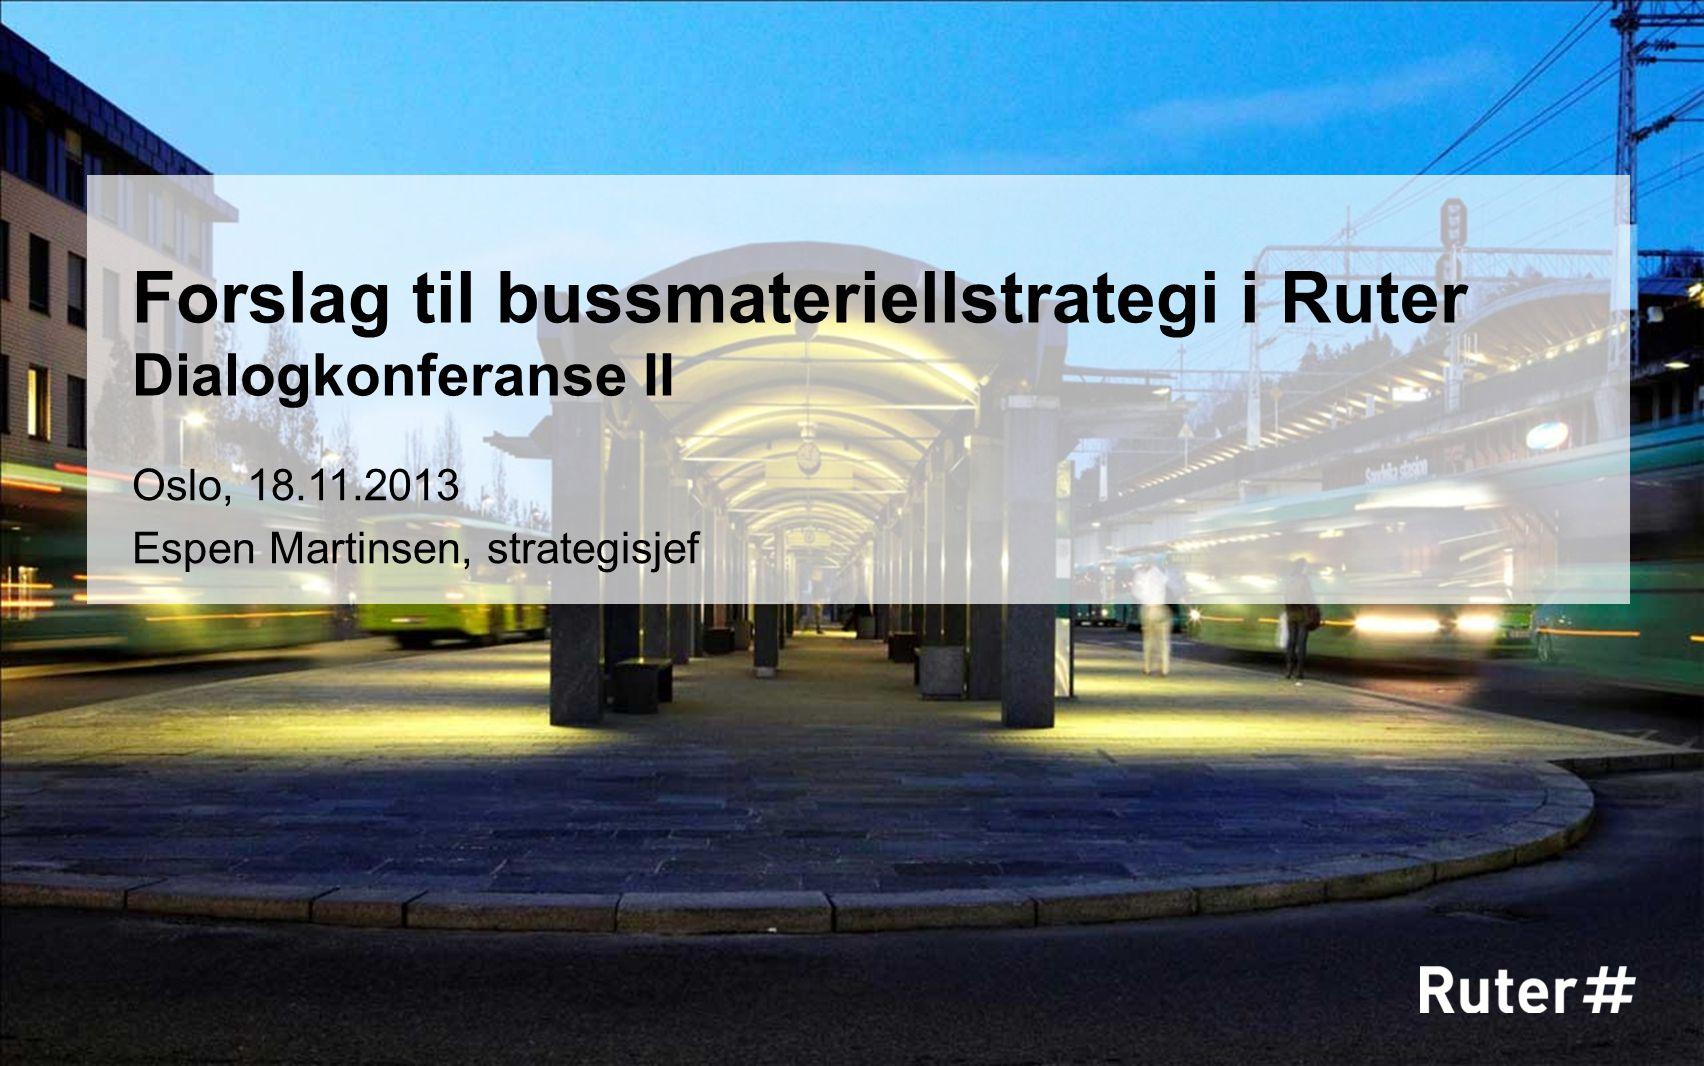 Oslo, 18.11.2013 Espen Martinsen, strategisjef Forslag til bussmateriellstrategi i Ruter Dialogkonferanse II